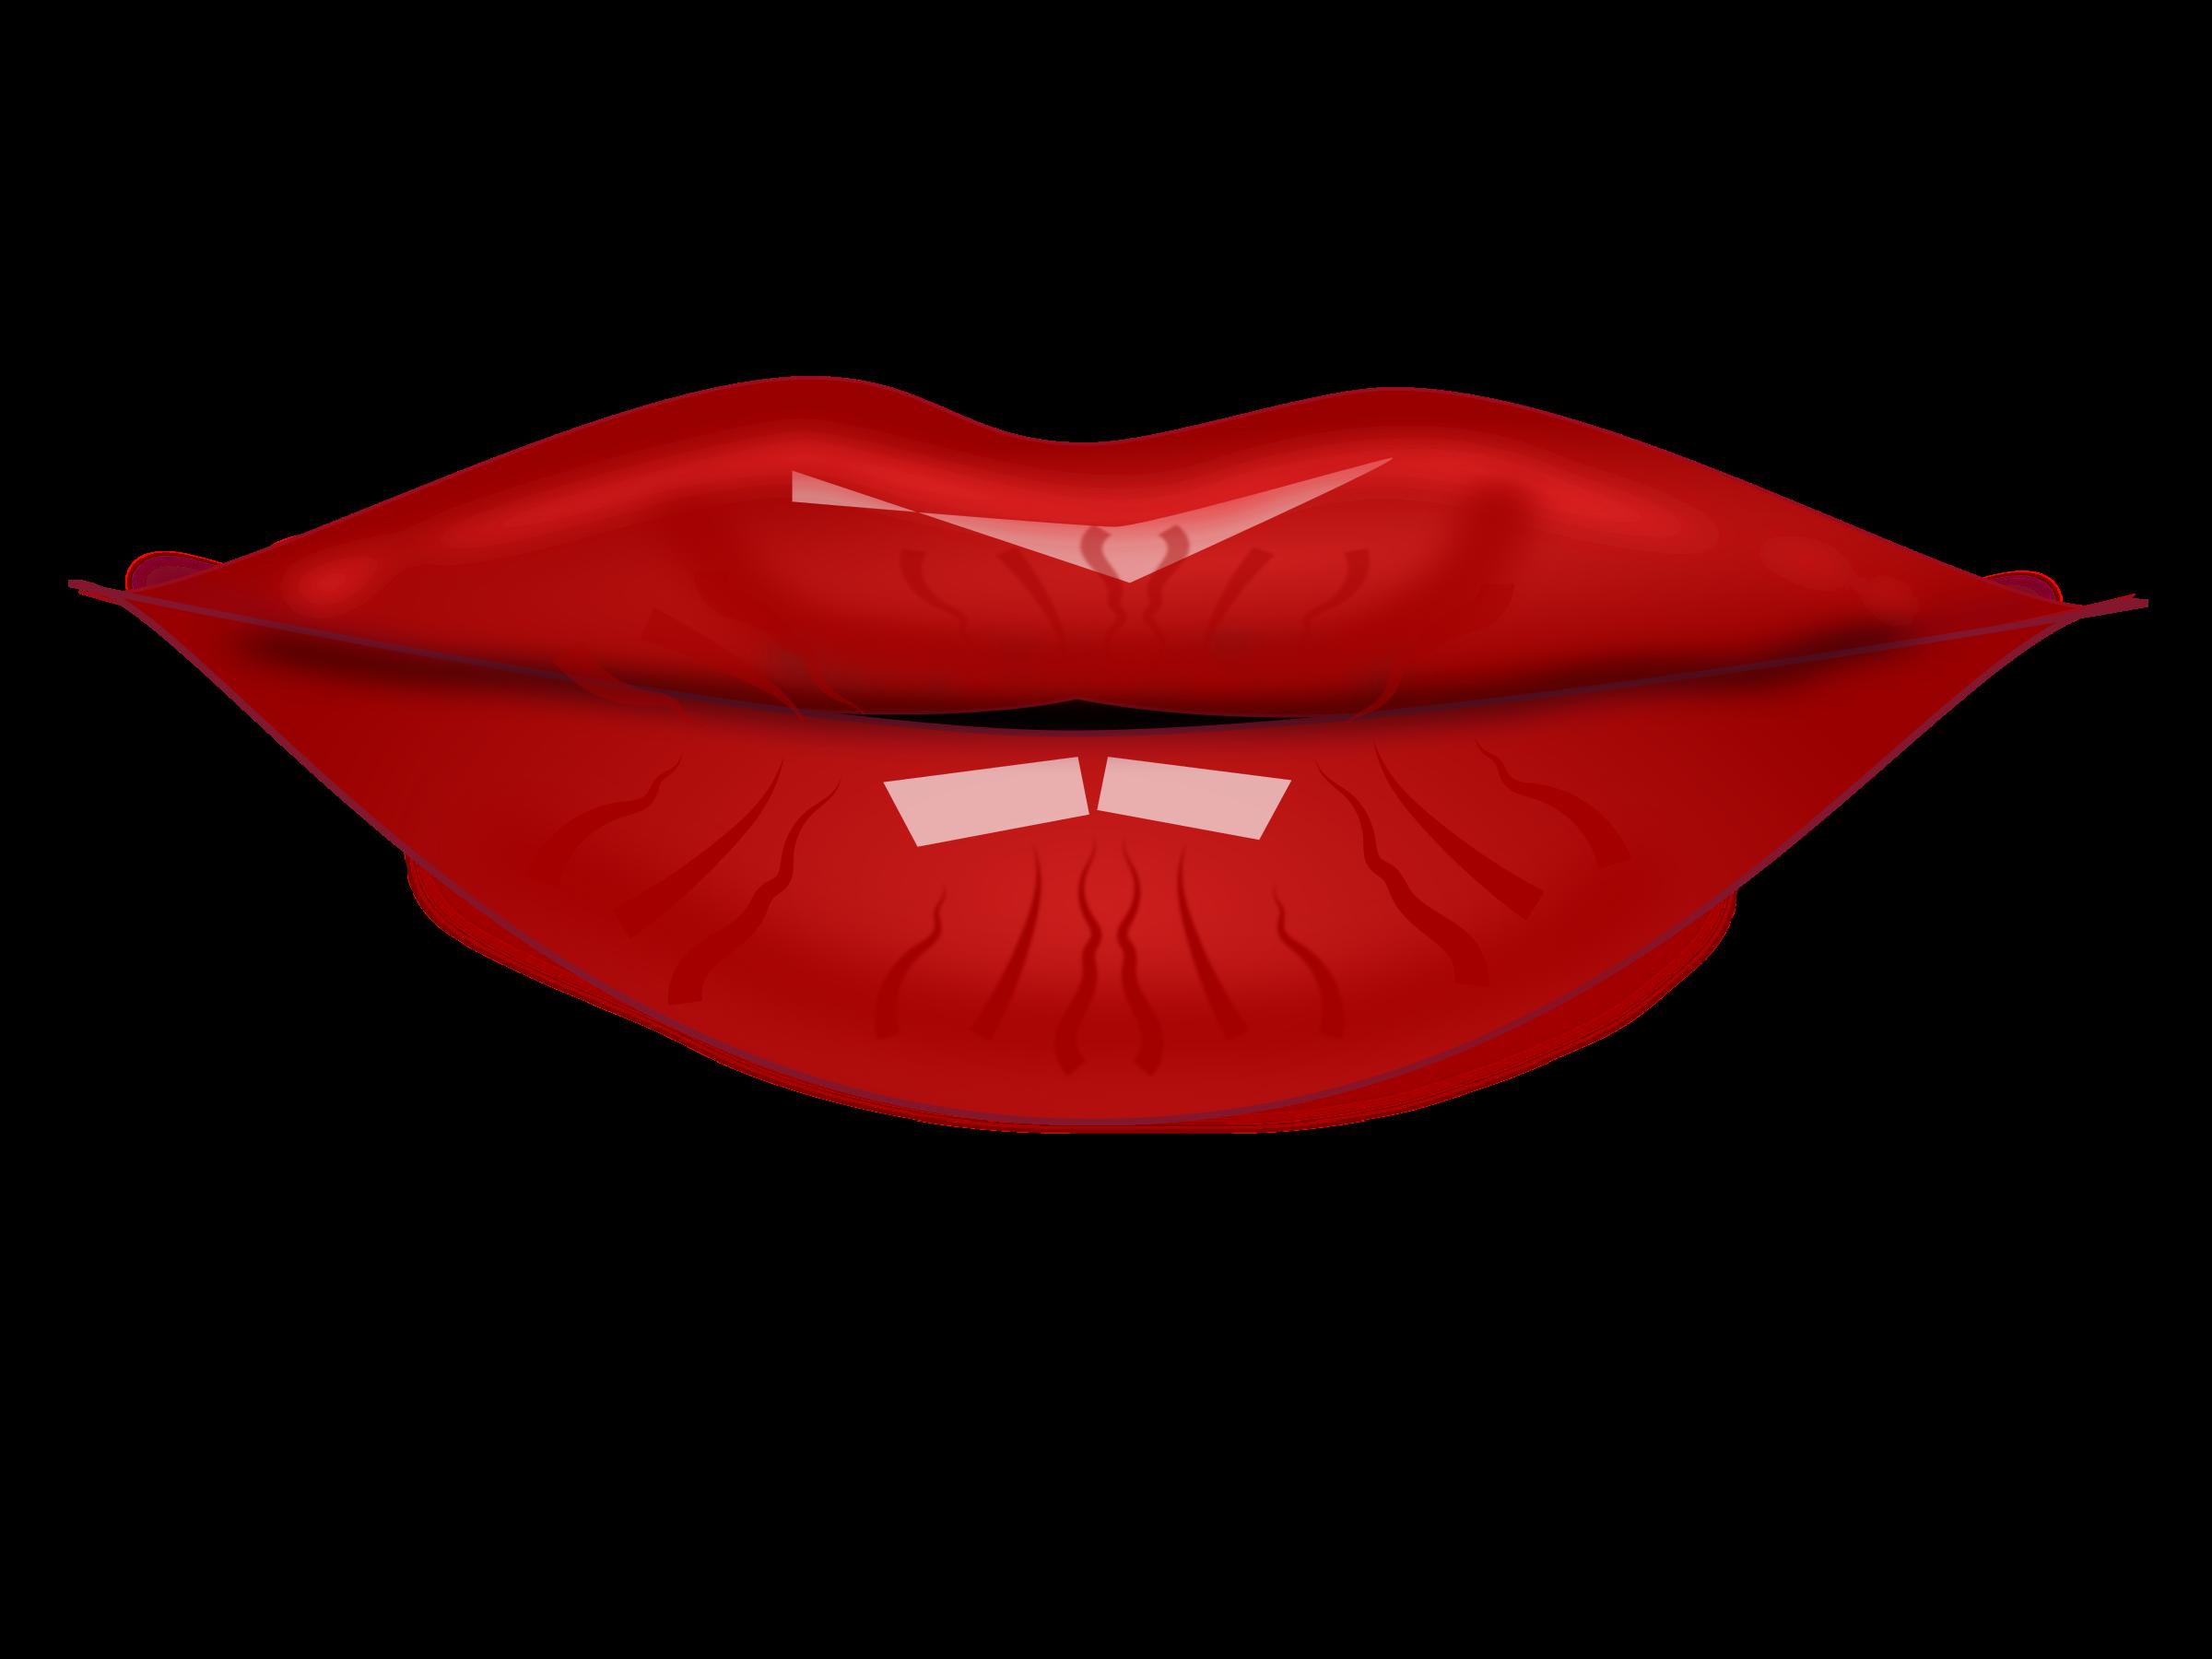 2400x1800 Lips Clip Art 3